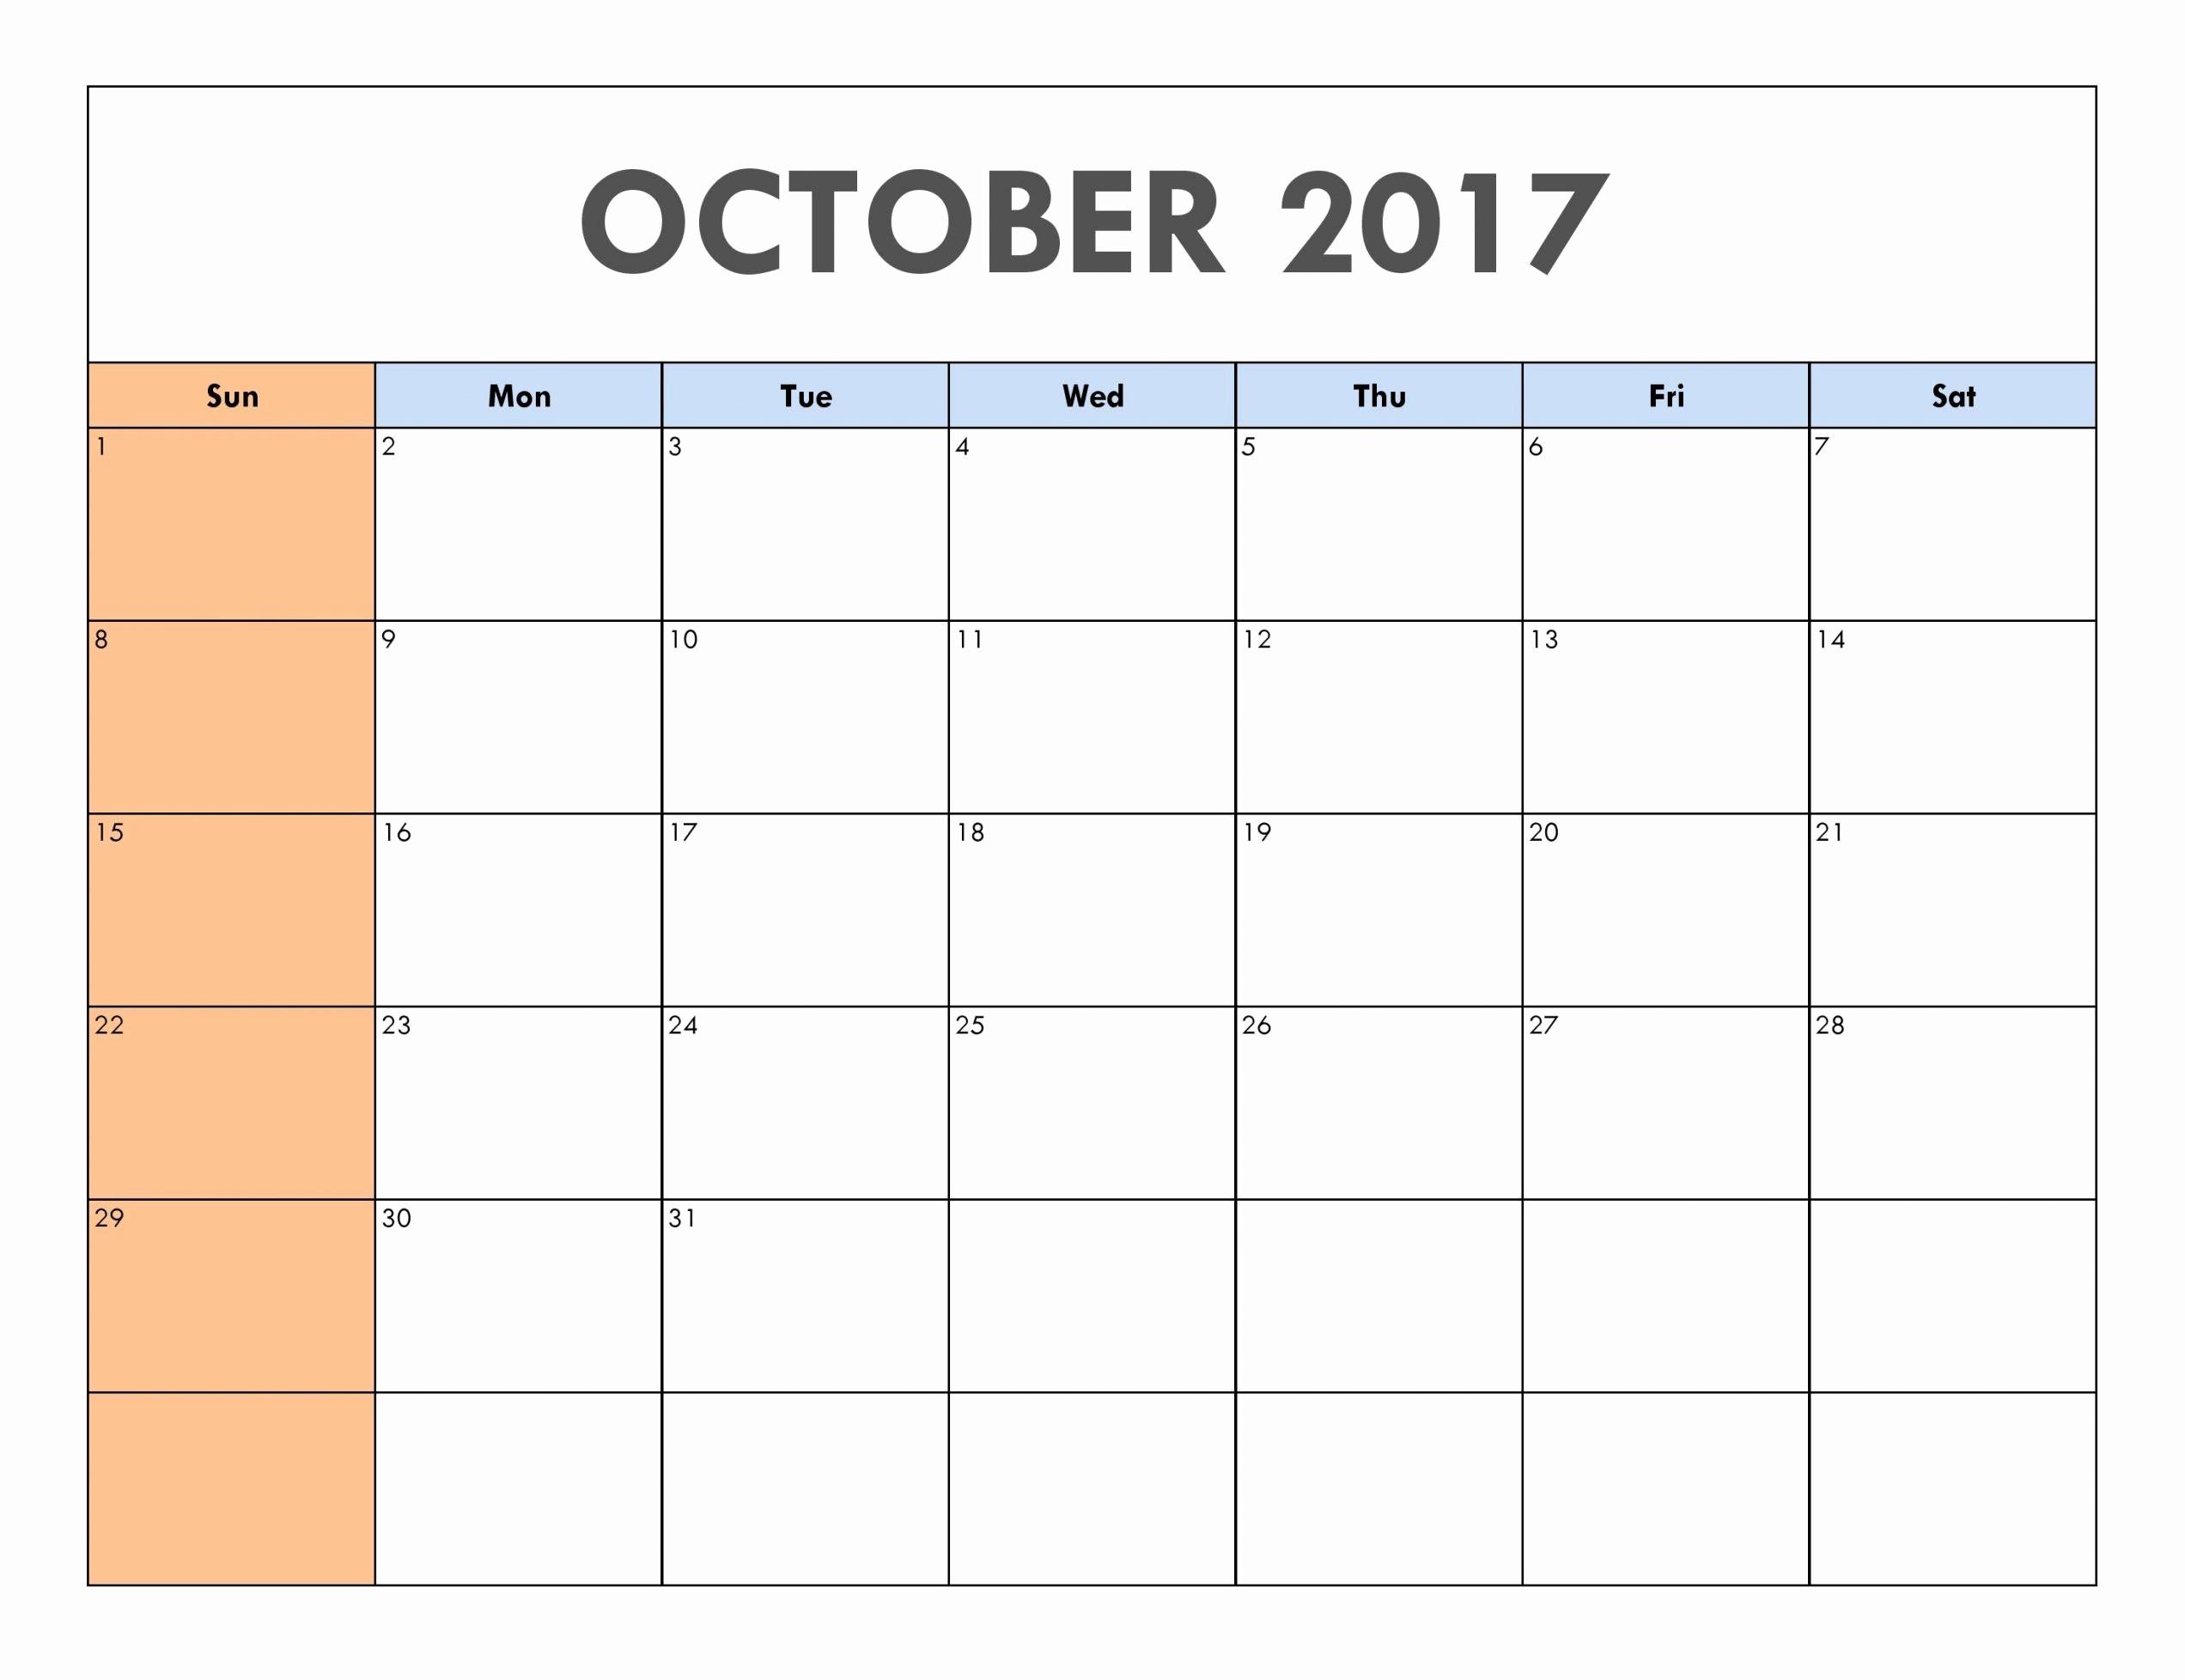 Blank Calendar Template August 2017 Best Of October 2017 Calendar Printable Template